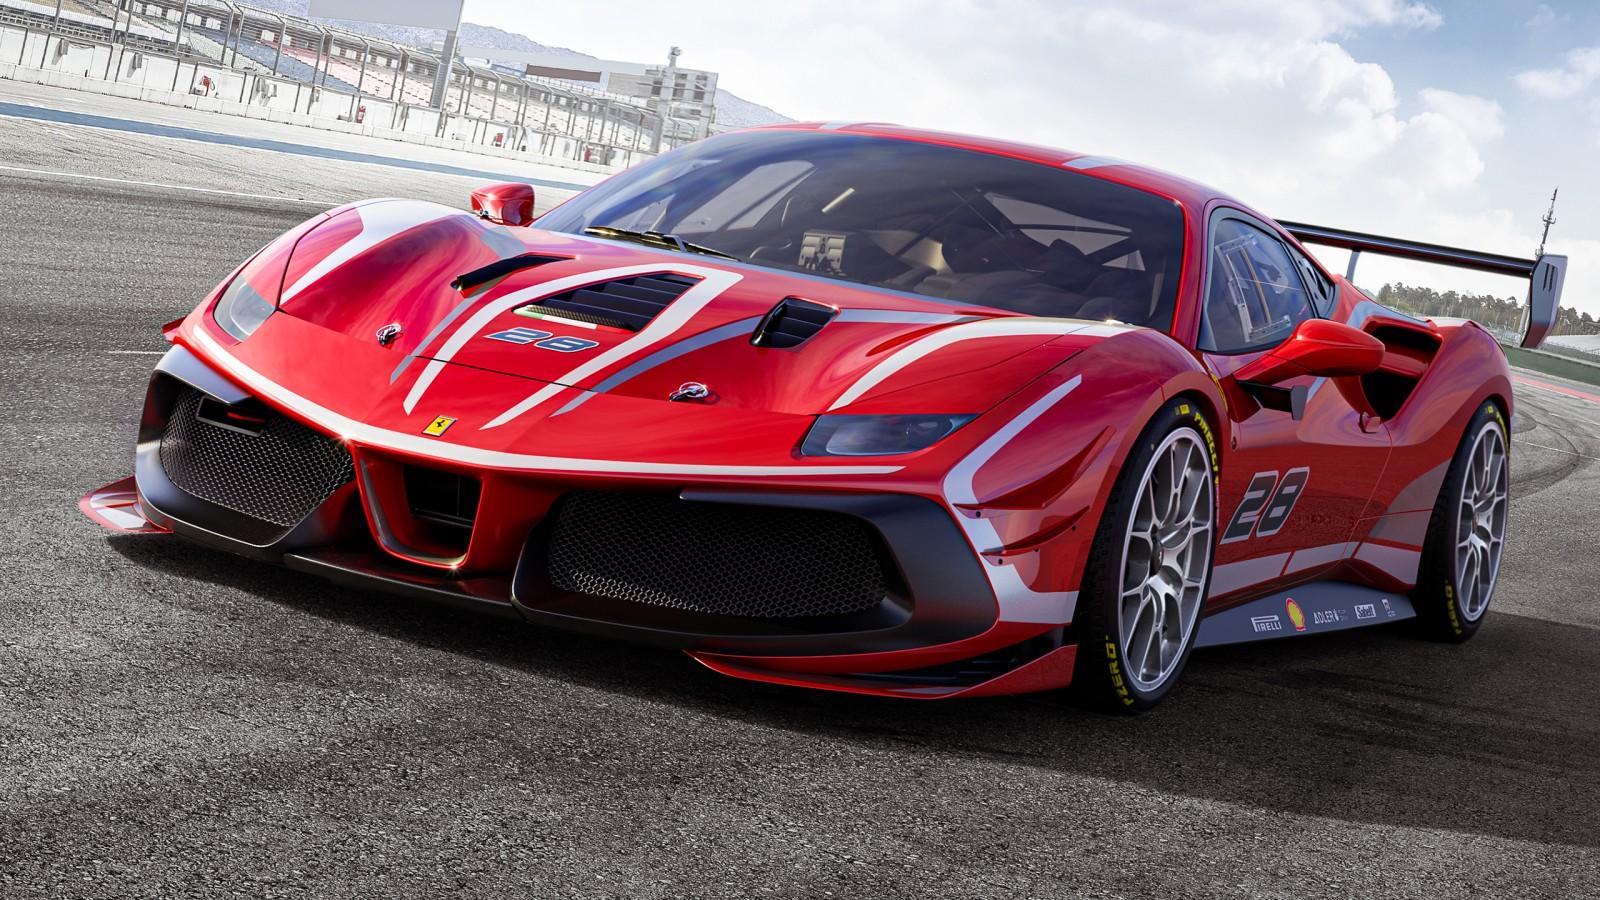 Ferrari 488 Challenge Evo 2020 2 Wallpaper HD Car Wallpapers 1600x900